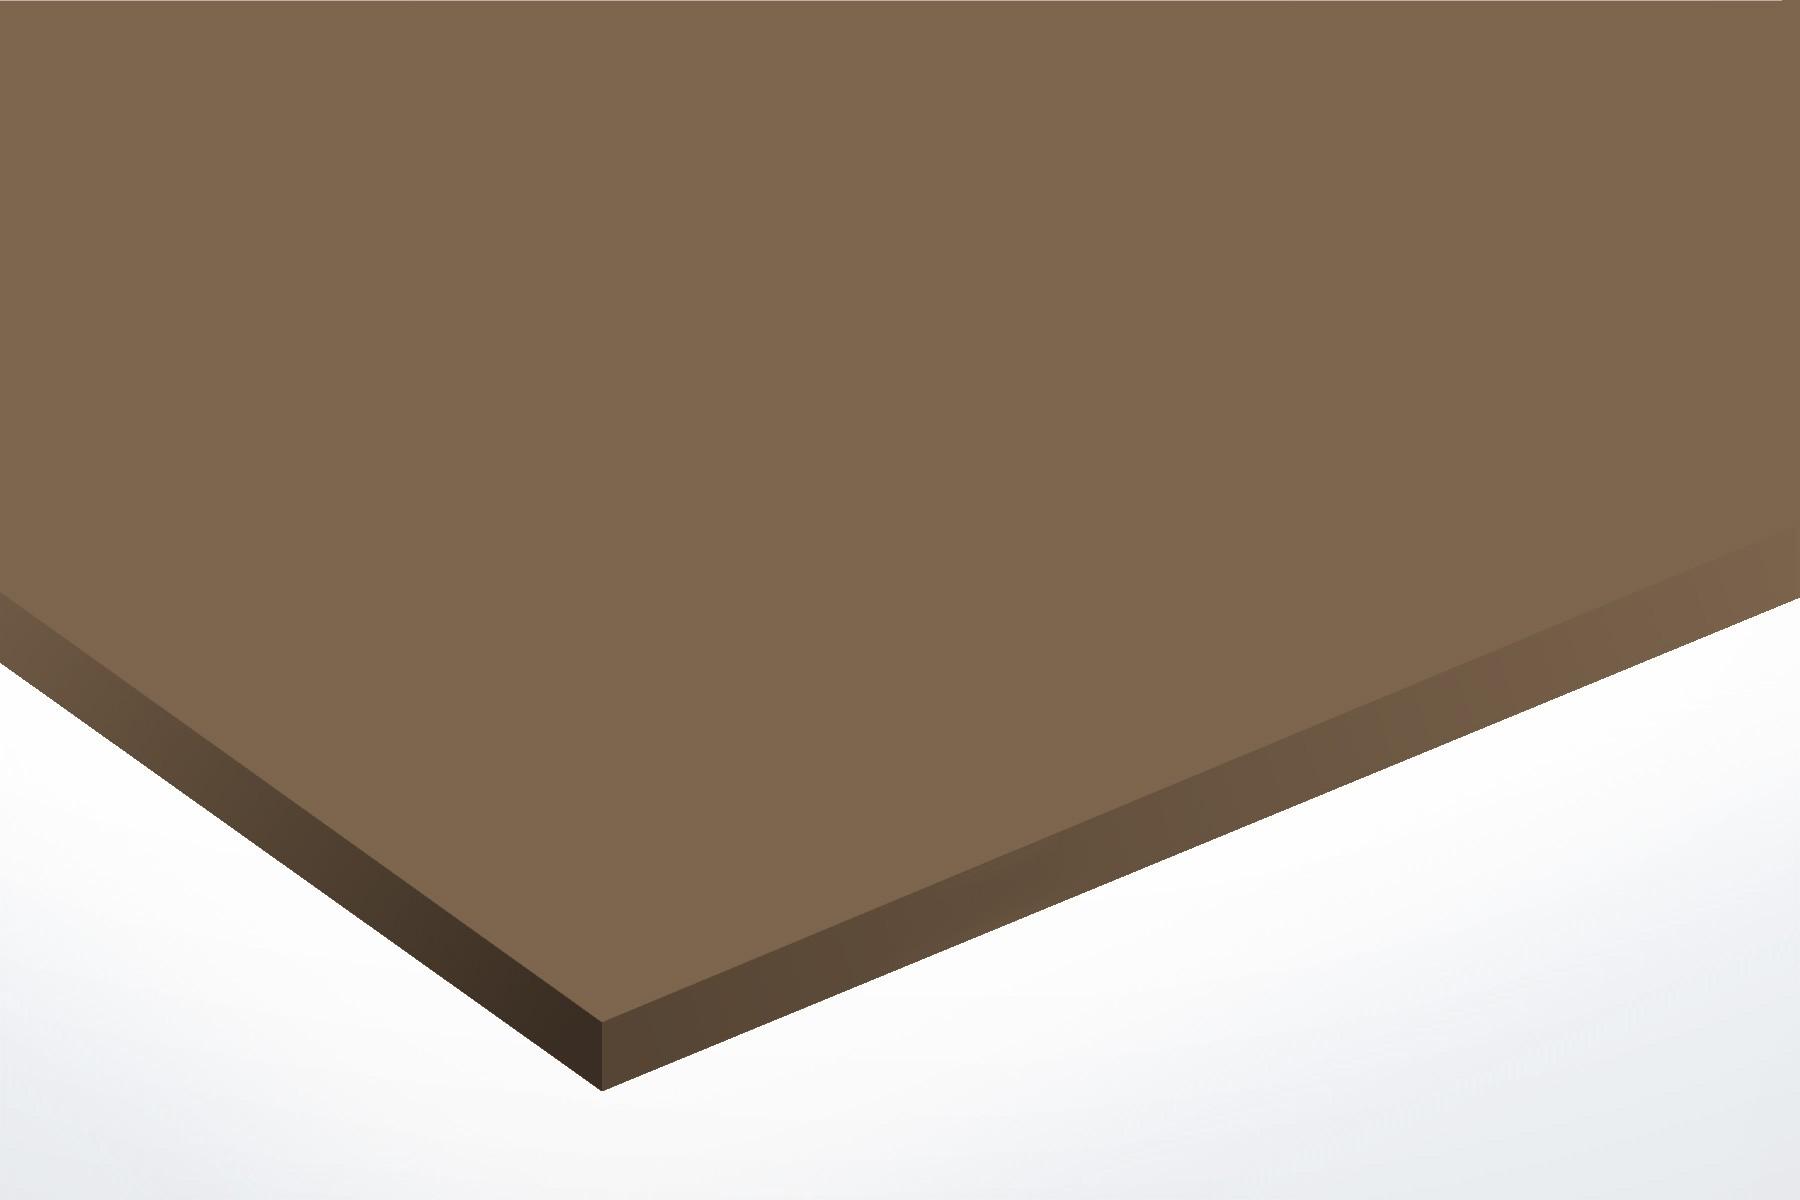 301/30/9397 Alu mat Bronze clair 3mm